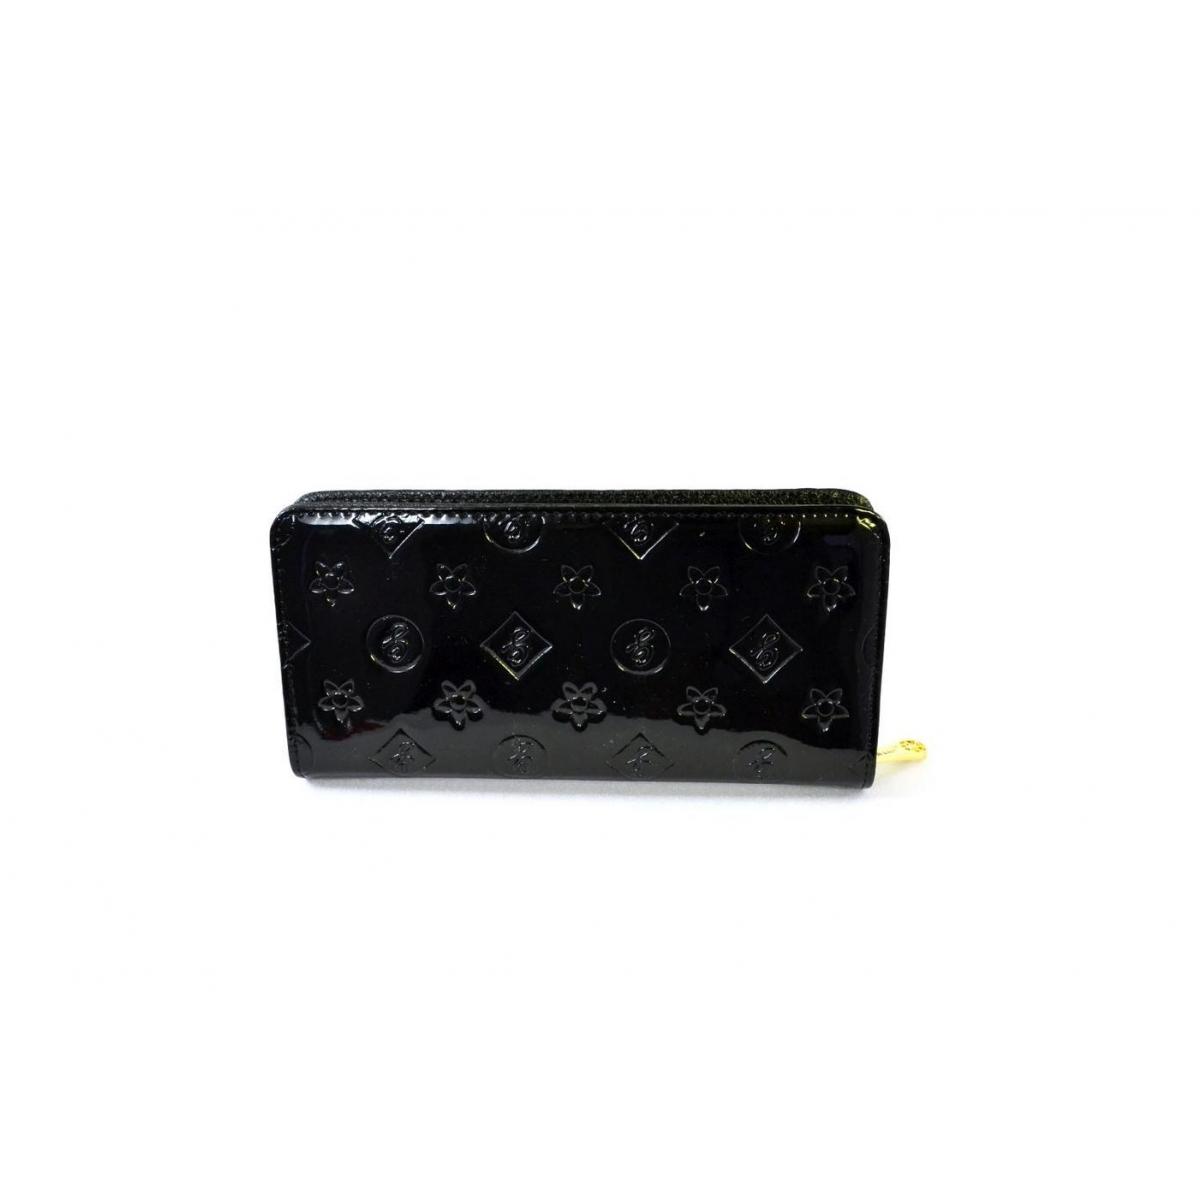 Dámska lesklá čierna peňaženka - 2 e7406d8a688